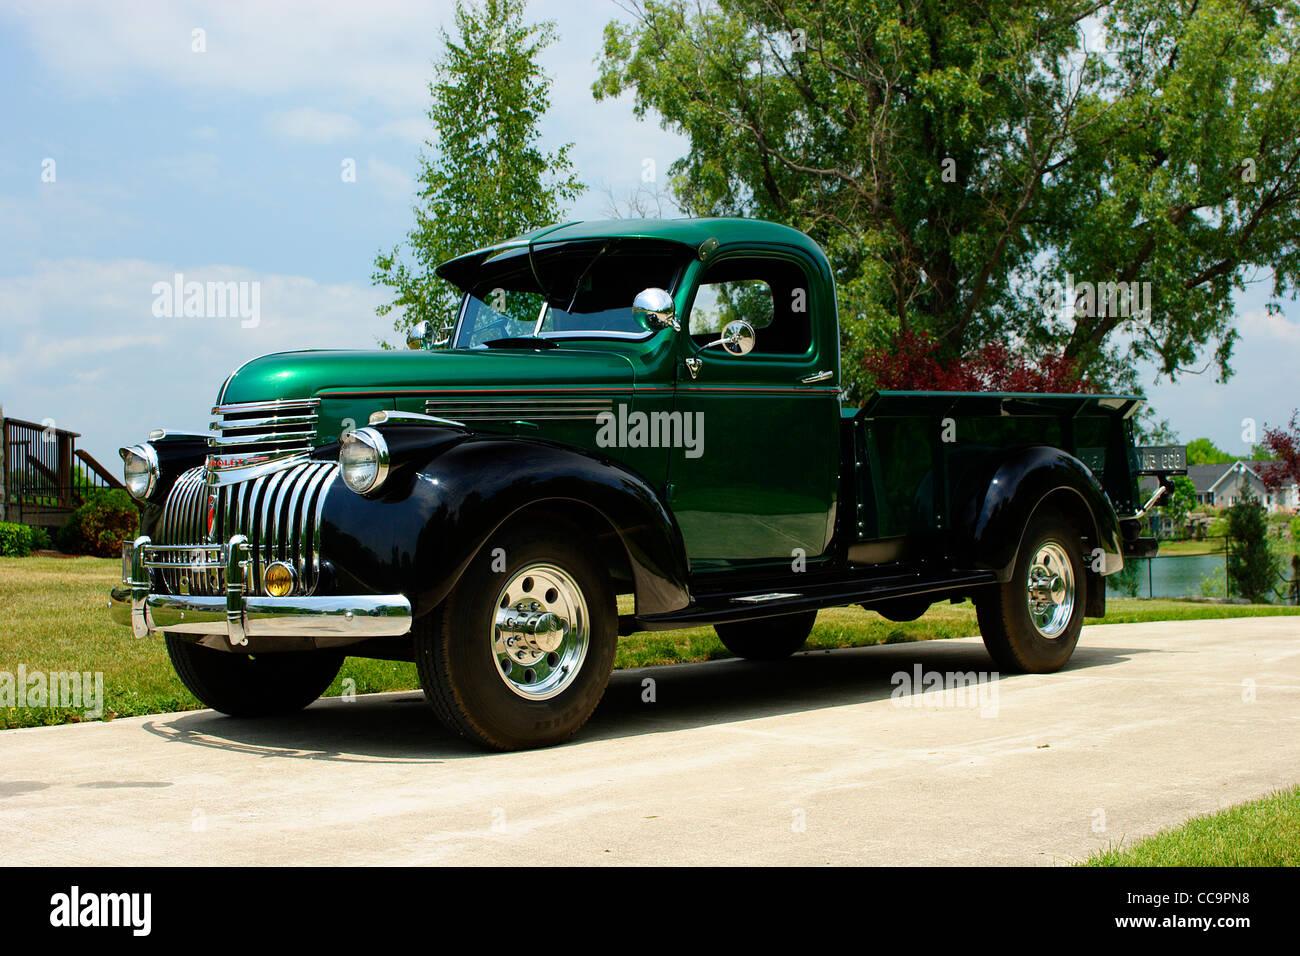 1946 Chevrolet 3/4 ton Pickup truck Stock Photo: 42012020